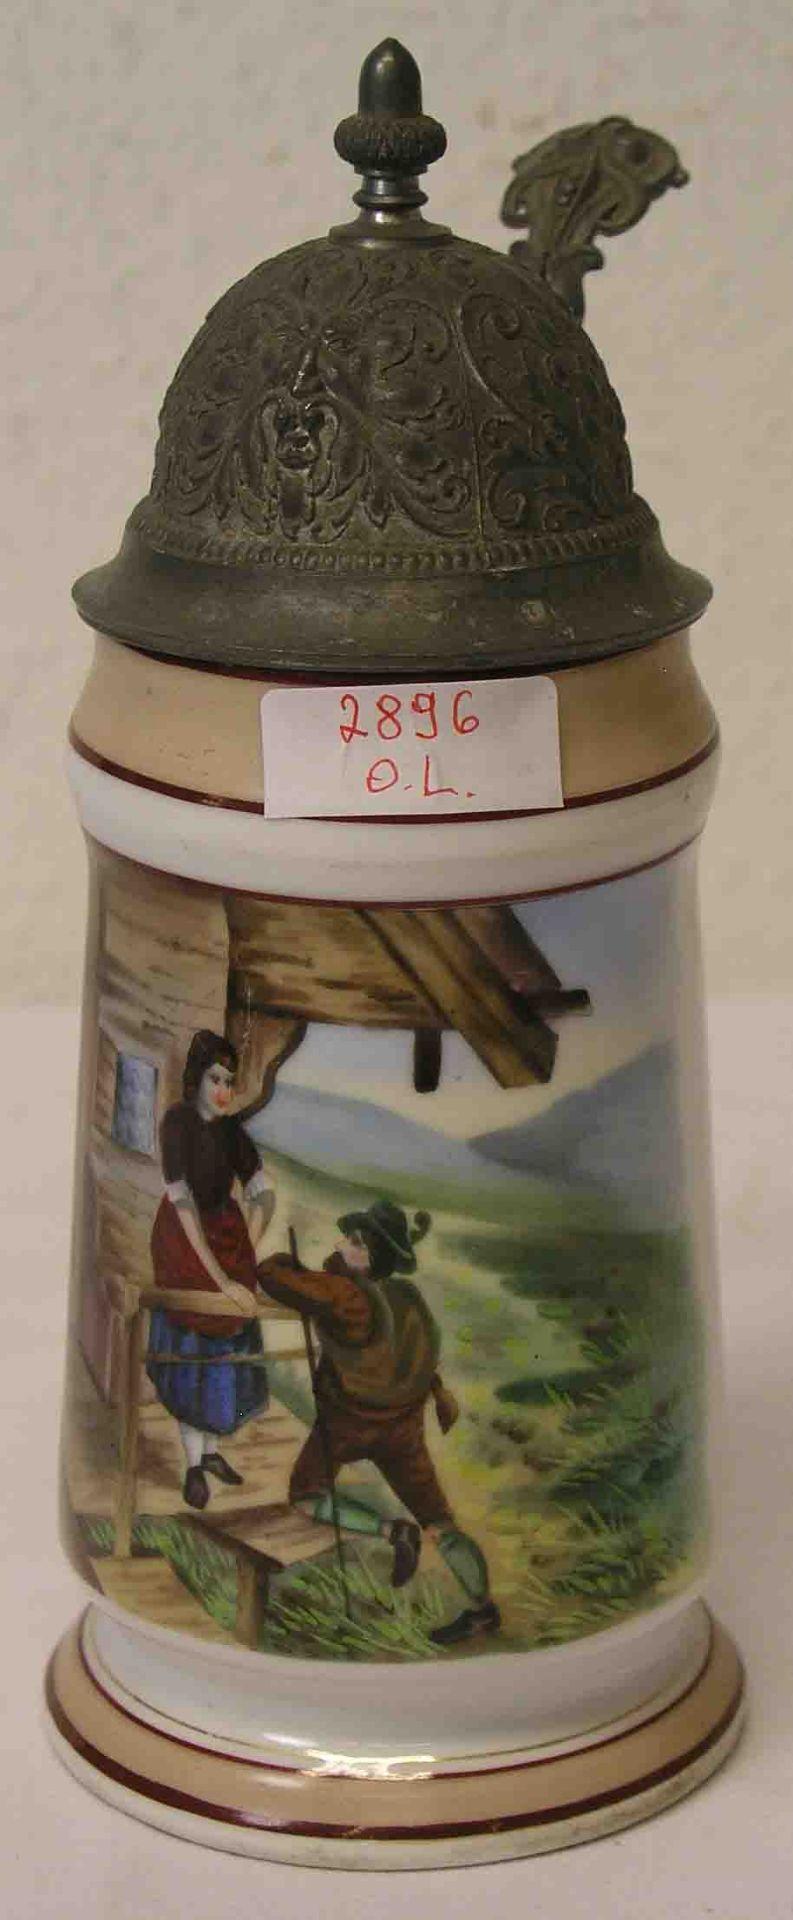 Bierkrug, 19. Jh., 0,5 Liter.